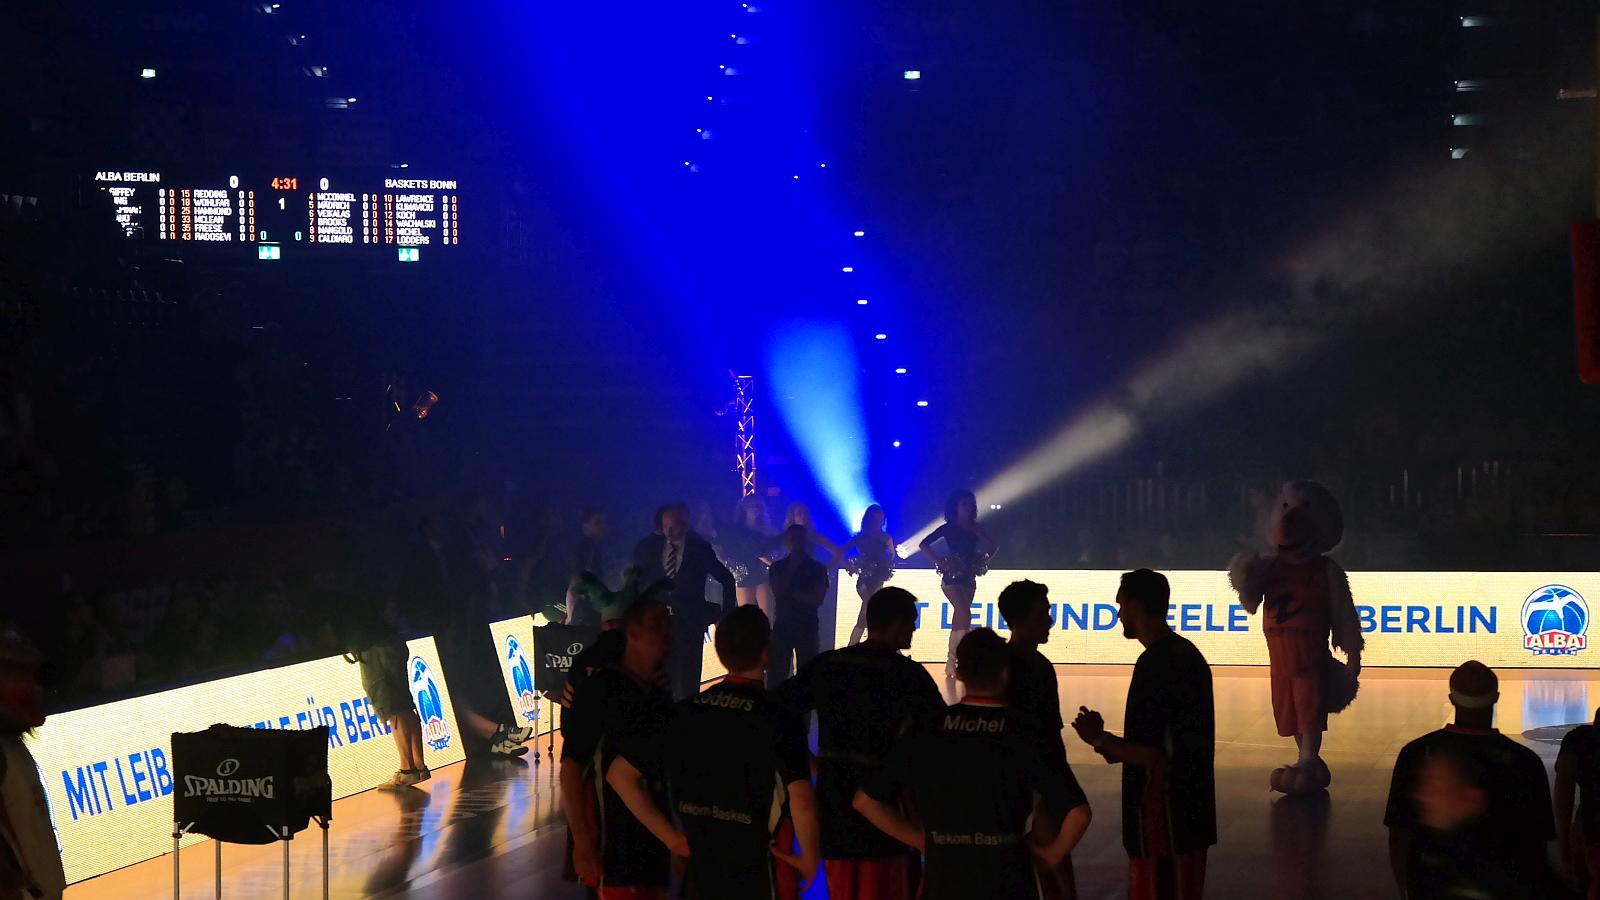 Spaß beim Spaßpokal, Oldenburg 2015